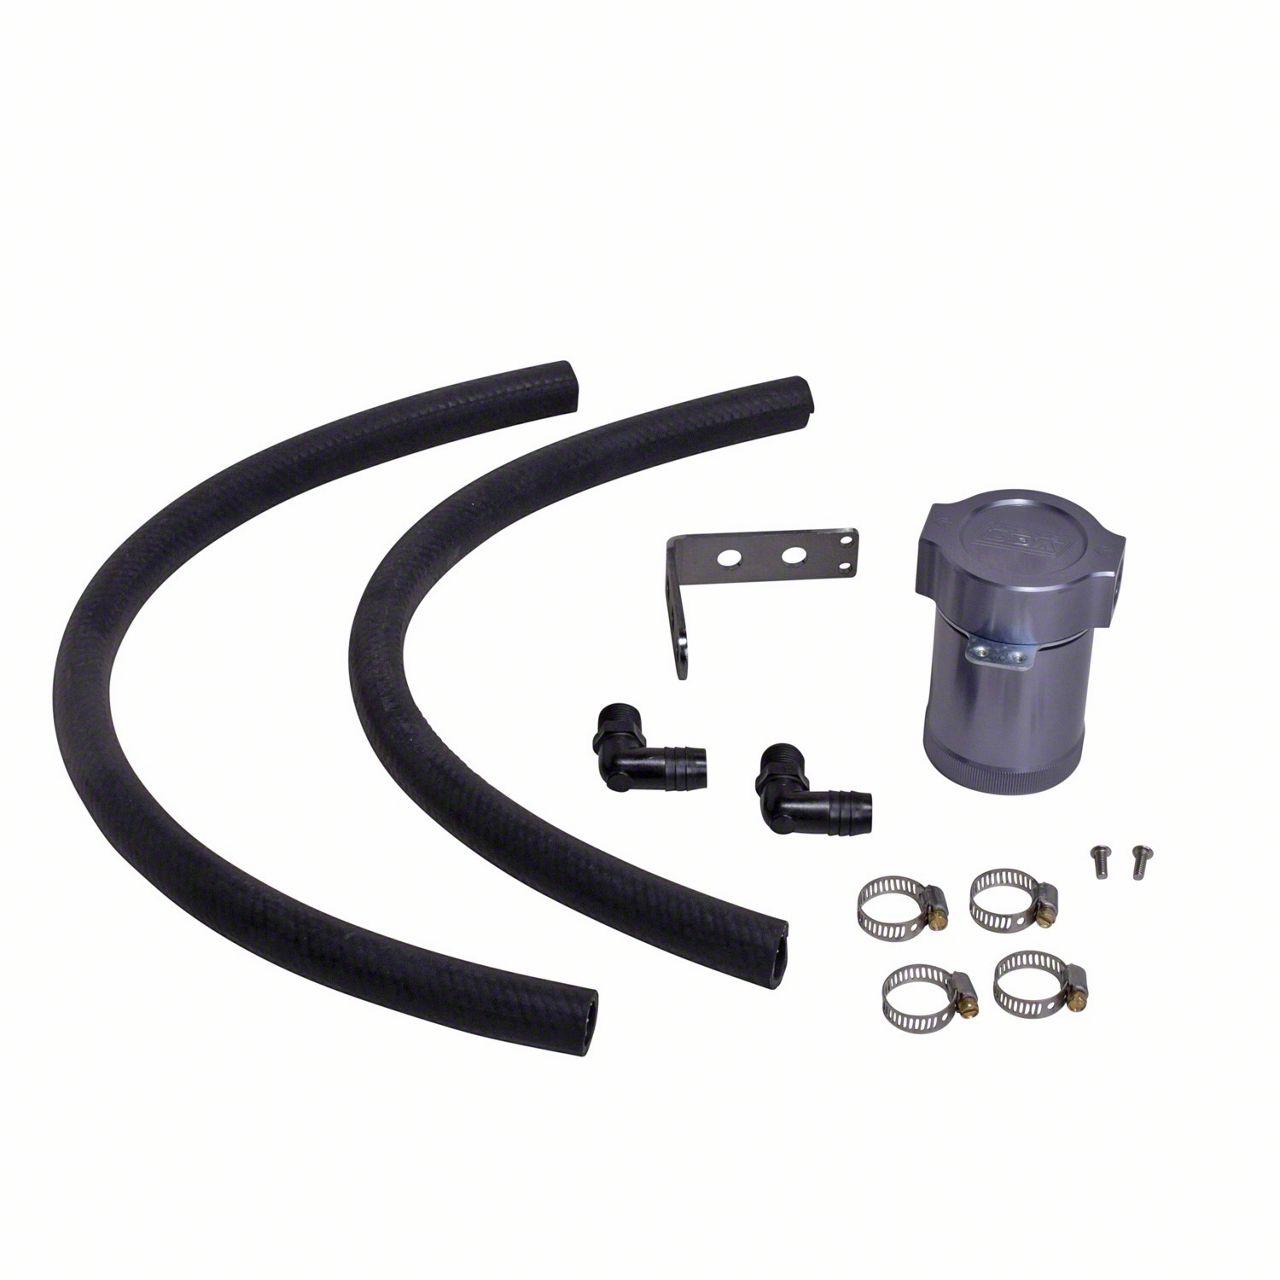 BBK Oil Separator - Passenger Side (15-17 3.5L V6, 5.0L F-150)